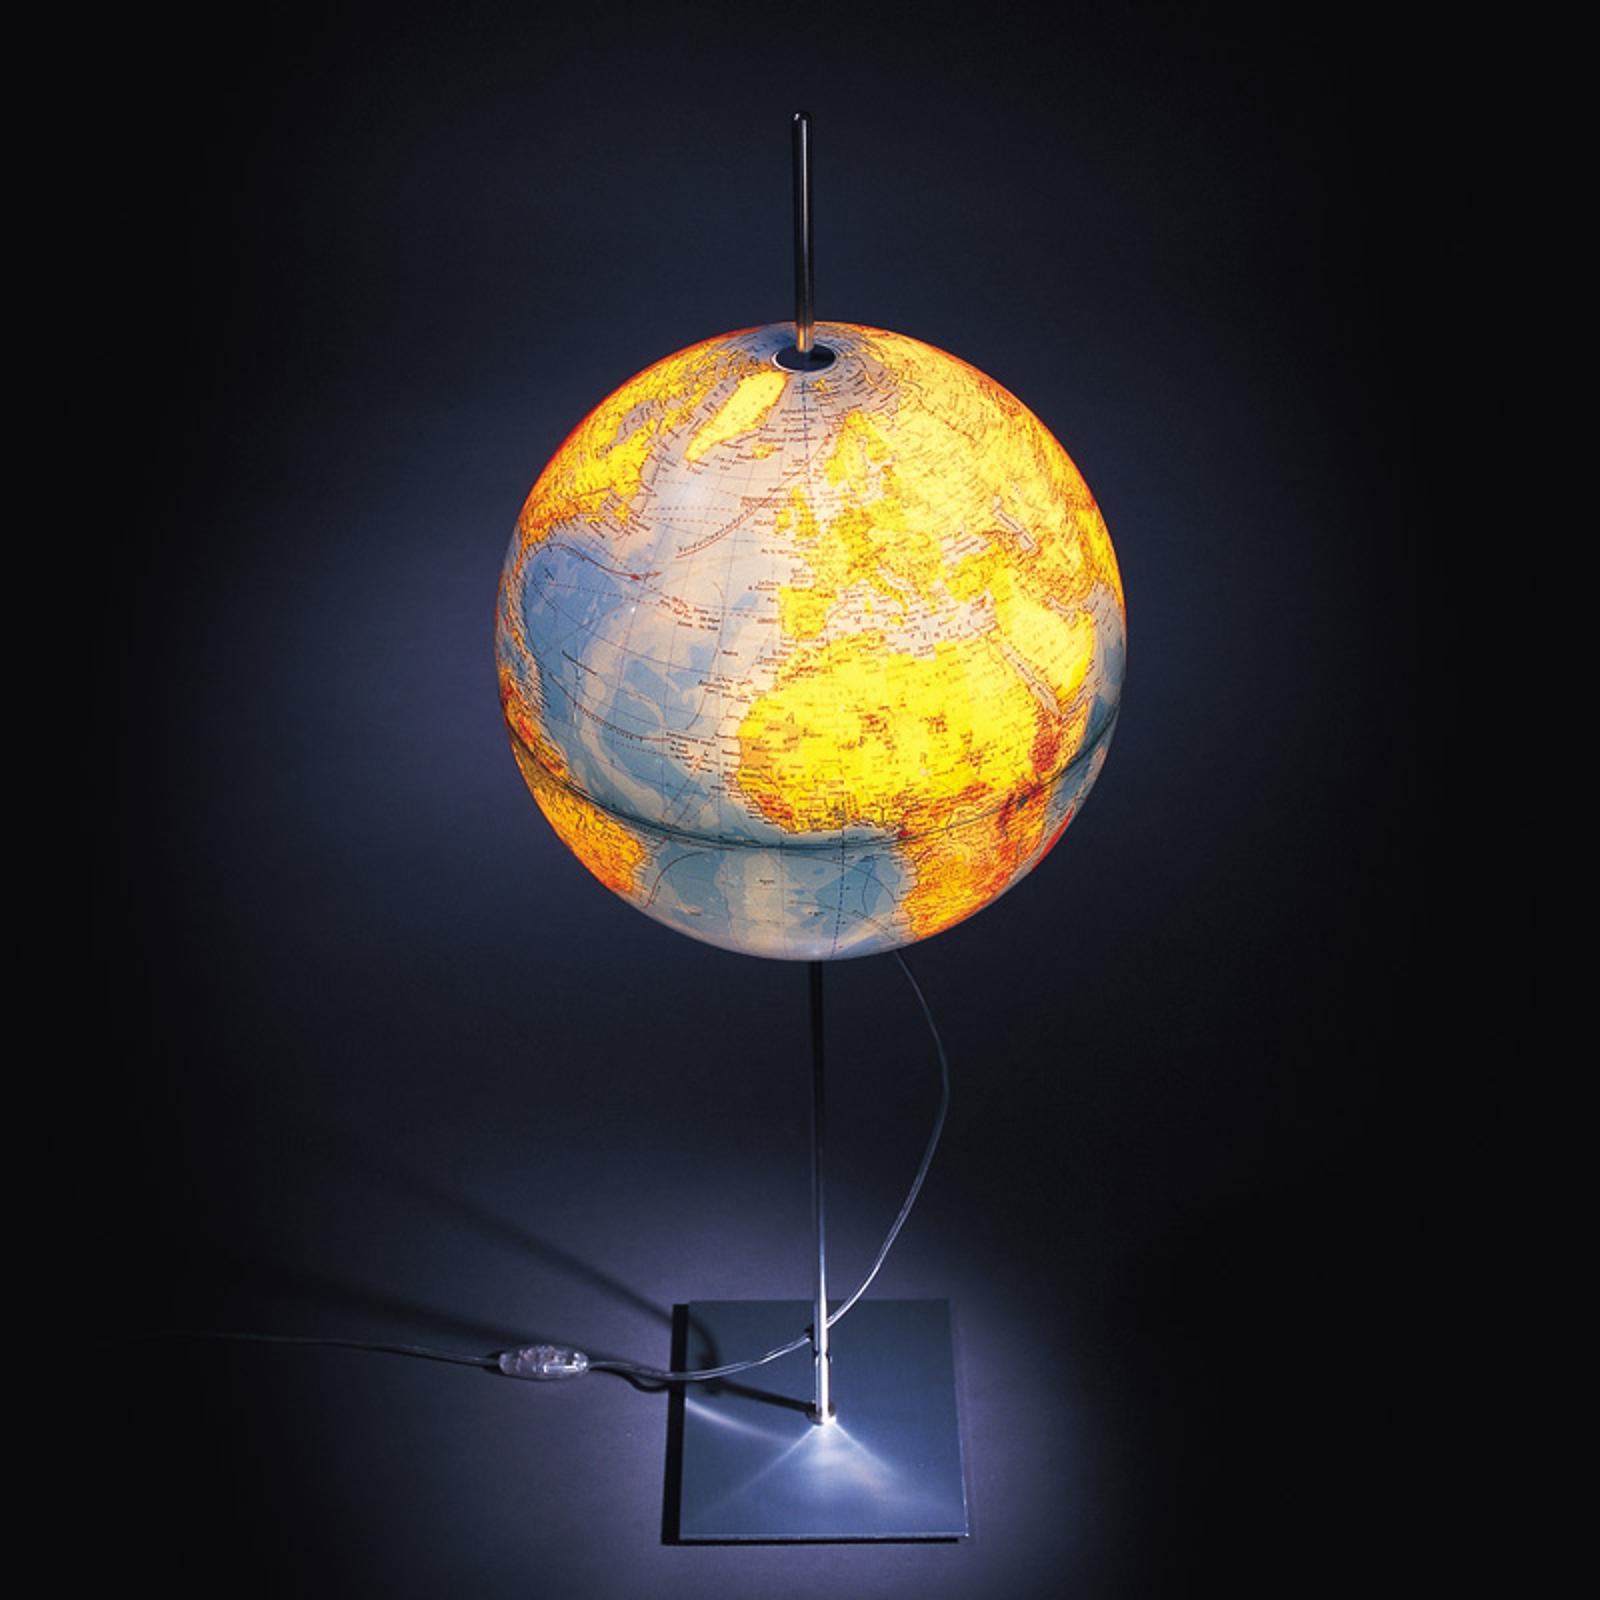 Lampadaire avec globe terrestre Globe Earth